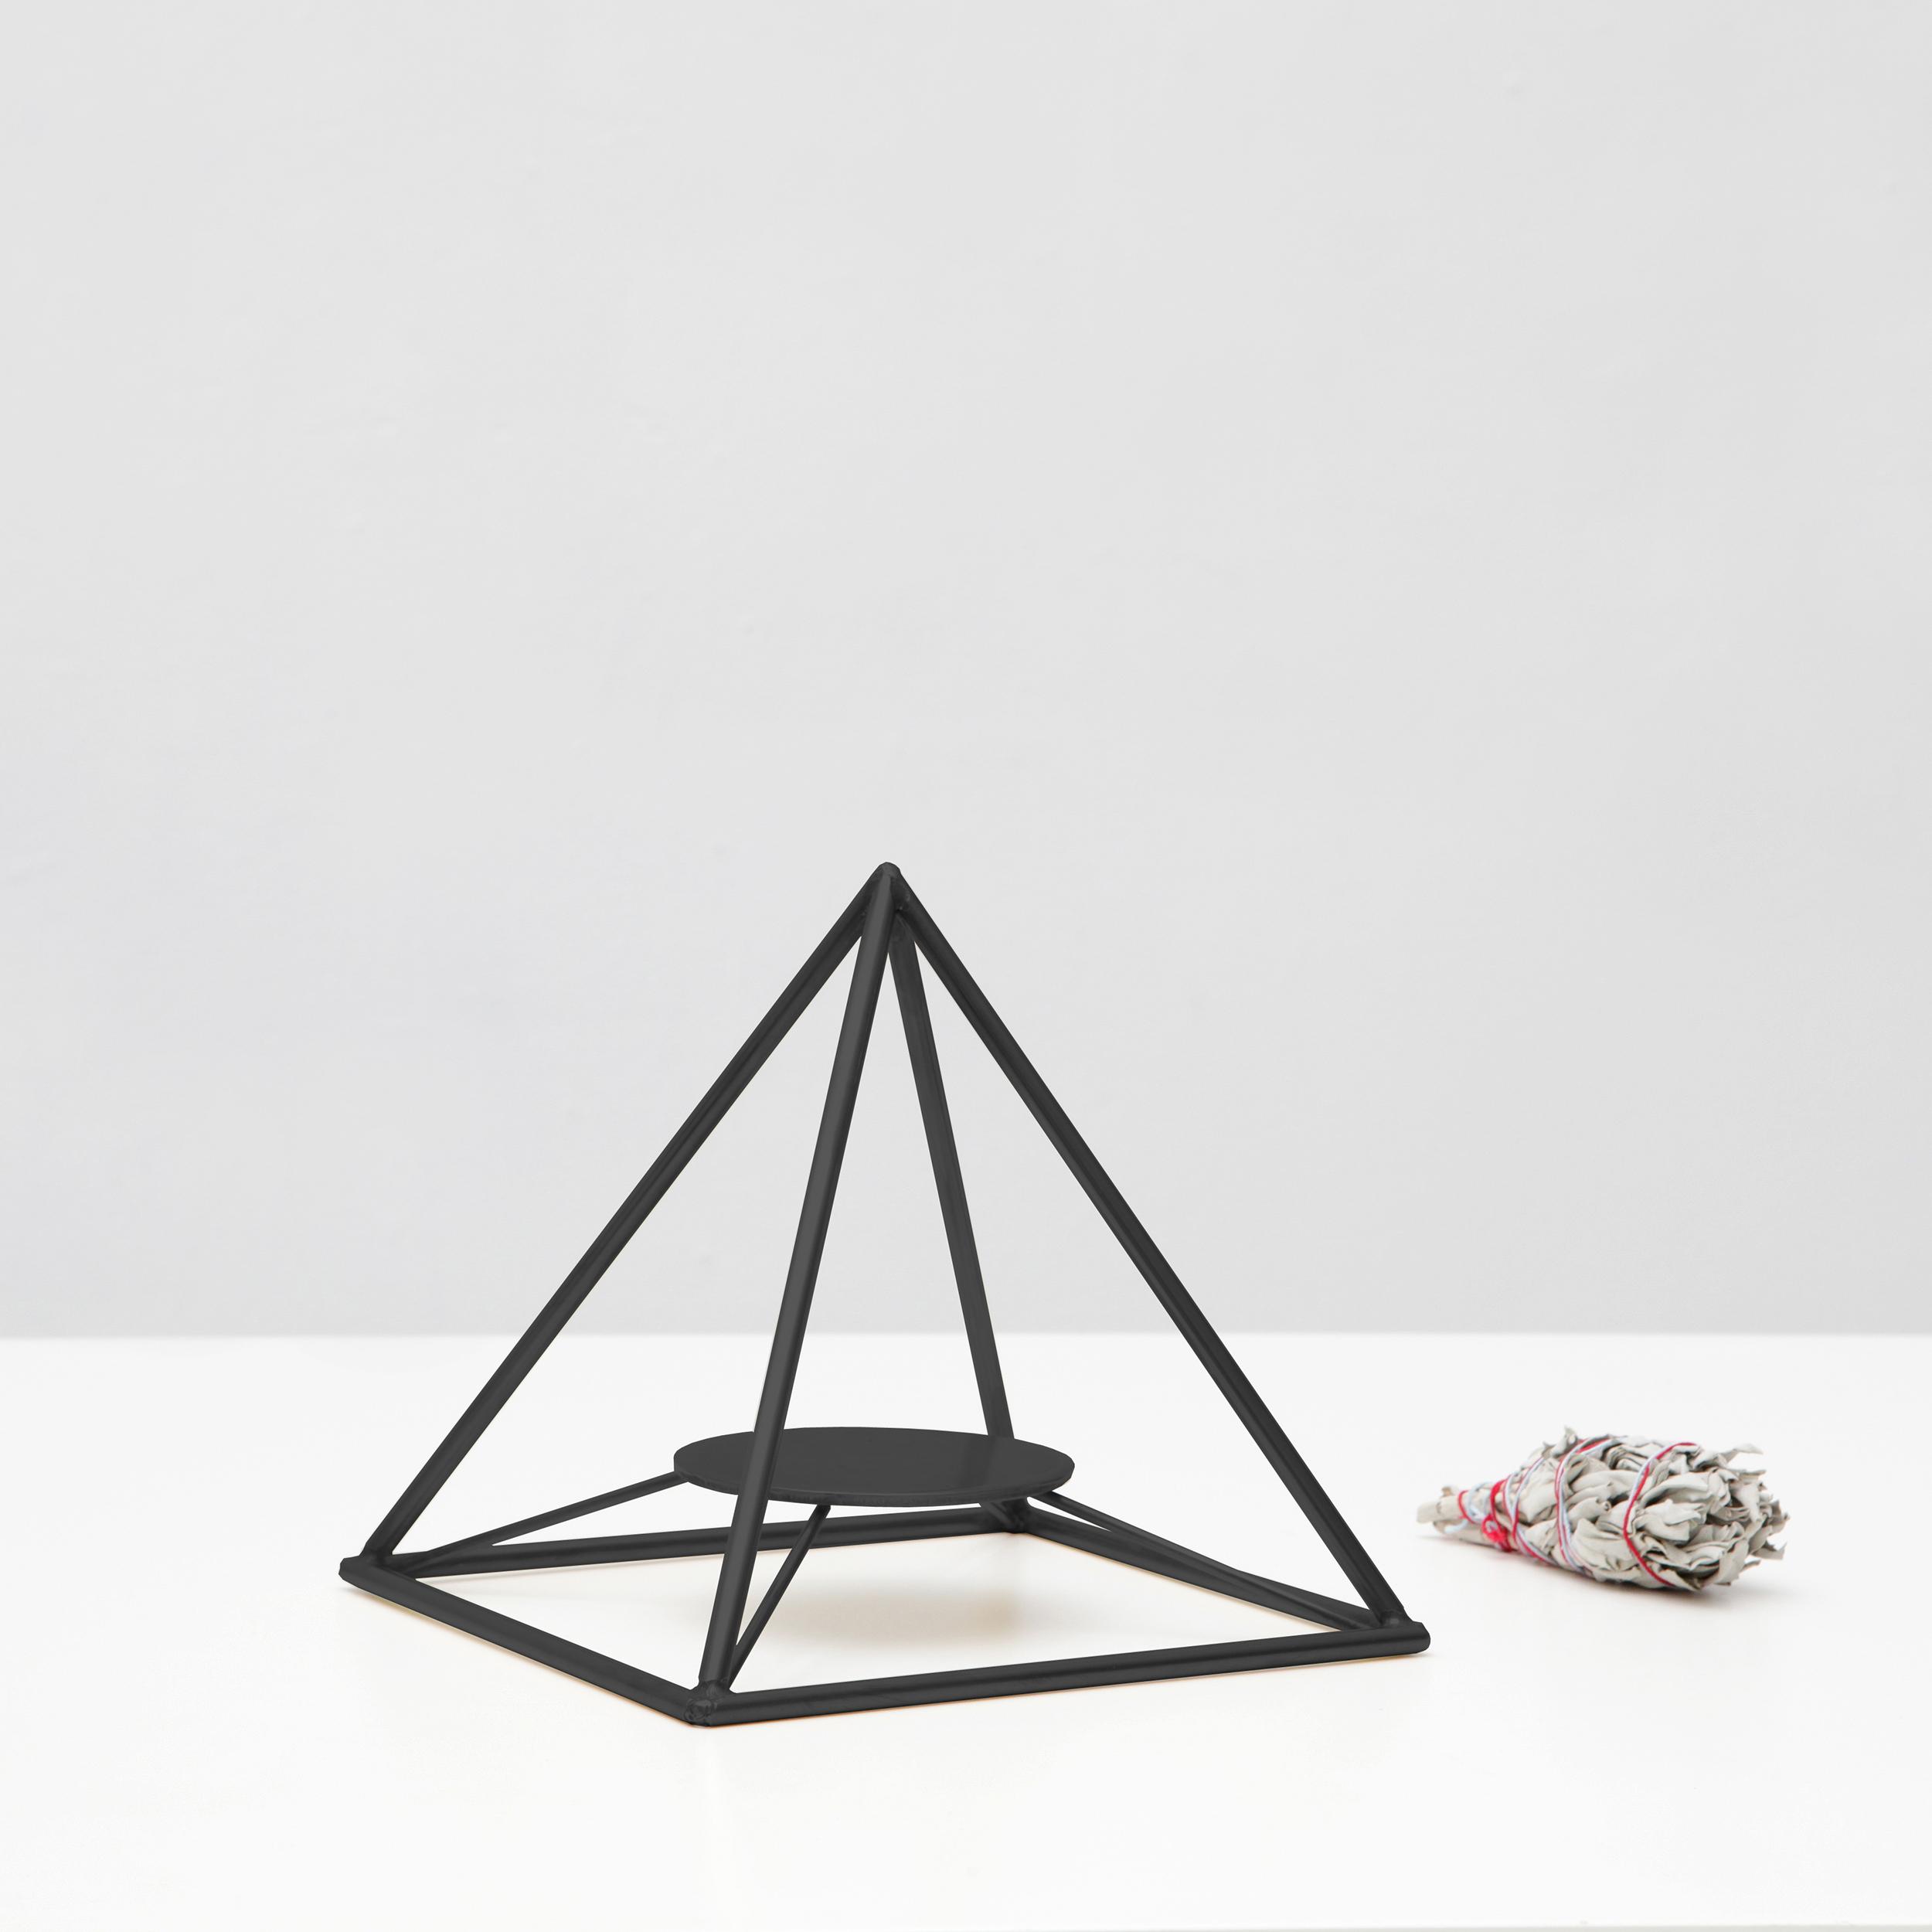 Sage Pyramid / Black